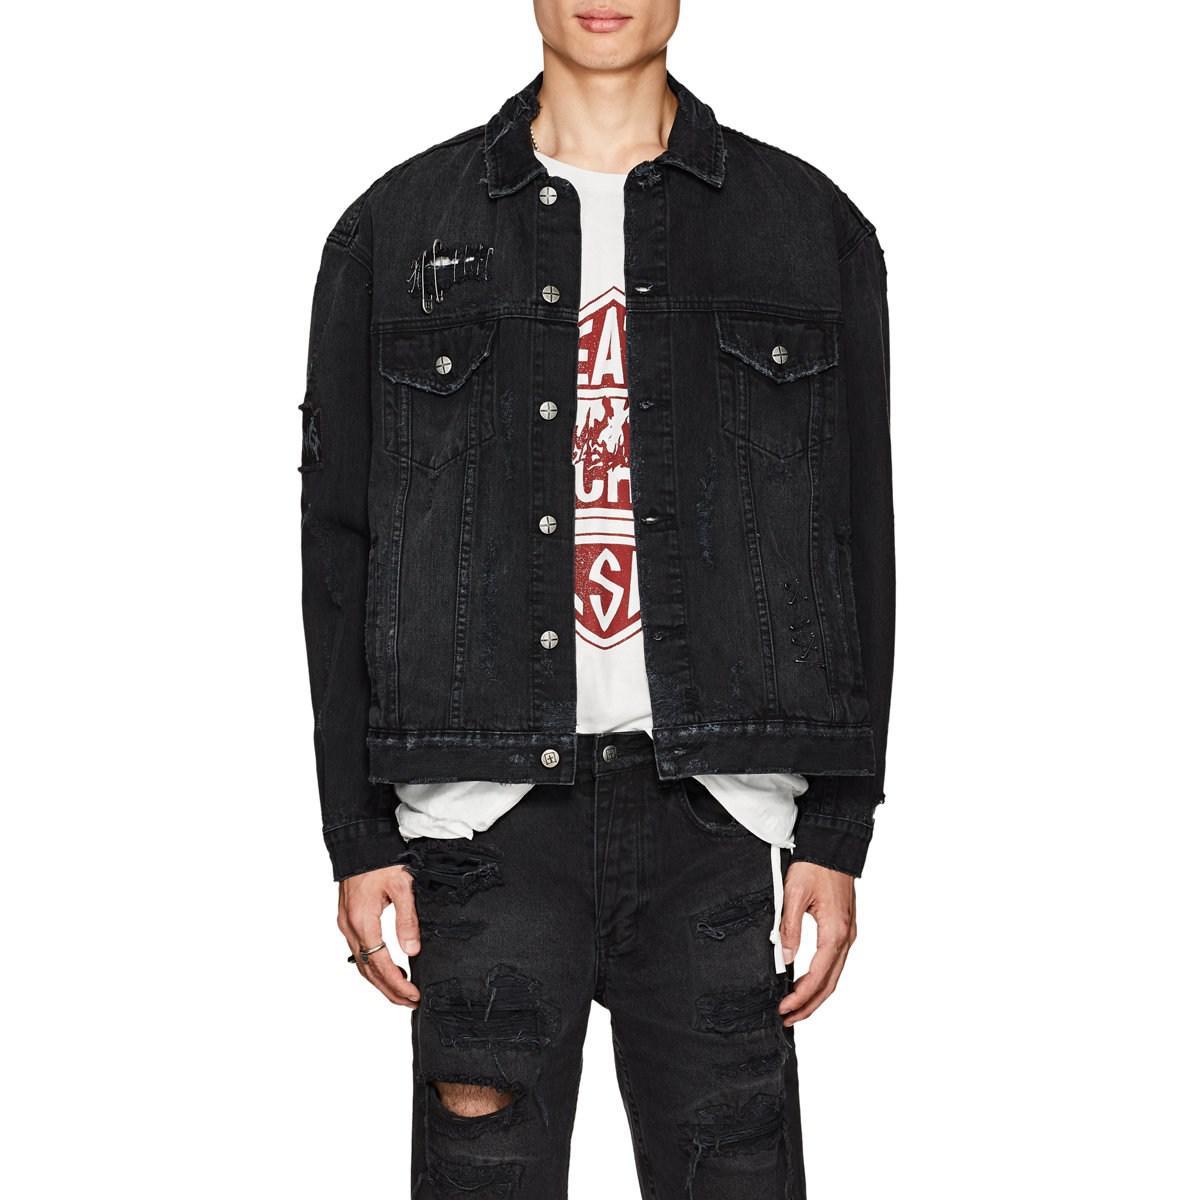 c2fb2e9191 Ksubi Oh G Distressed Denim Oversized Jacket in Black for Men - Lyst